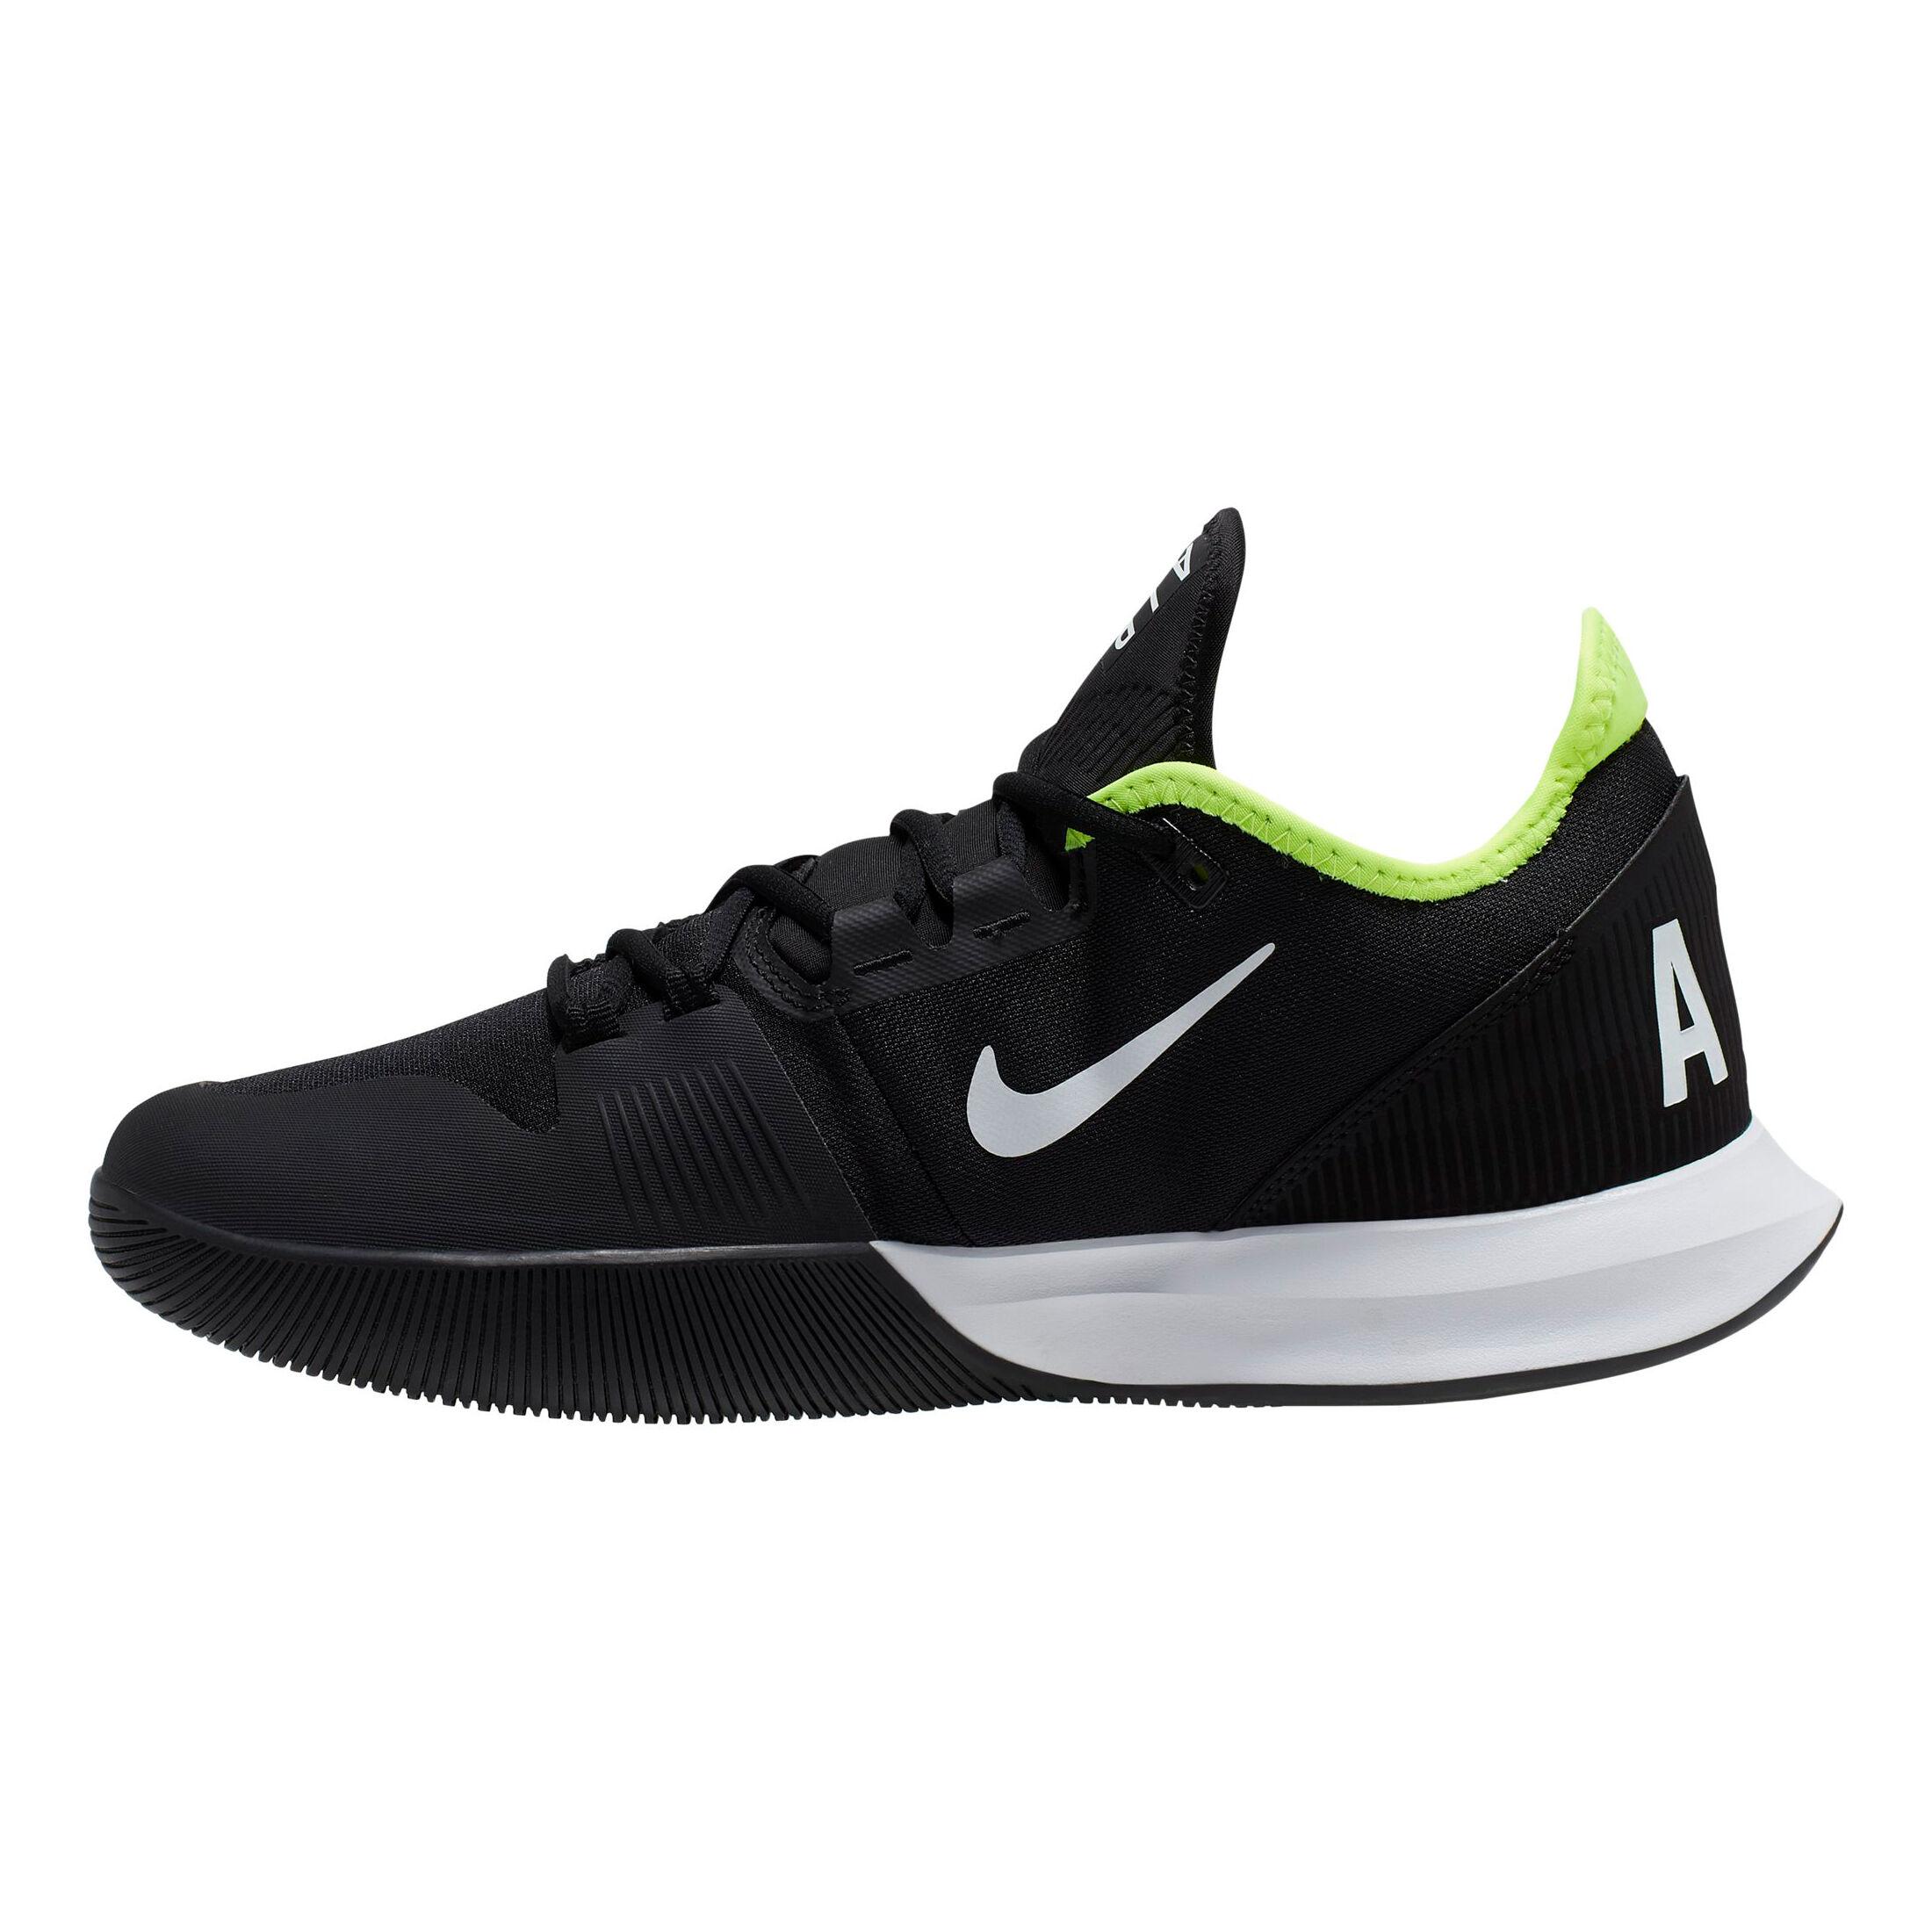 Nike Air Max Wildcard Allcourt Schoen Heren Zwart, Wit